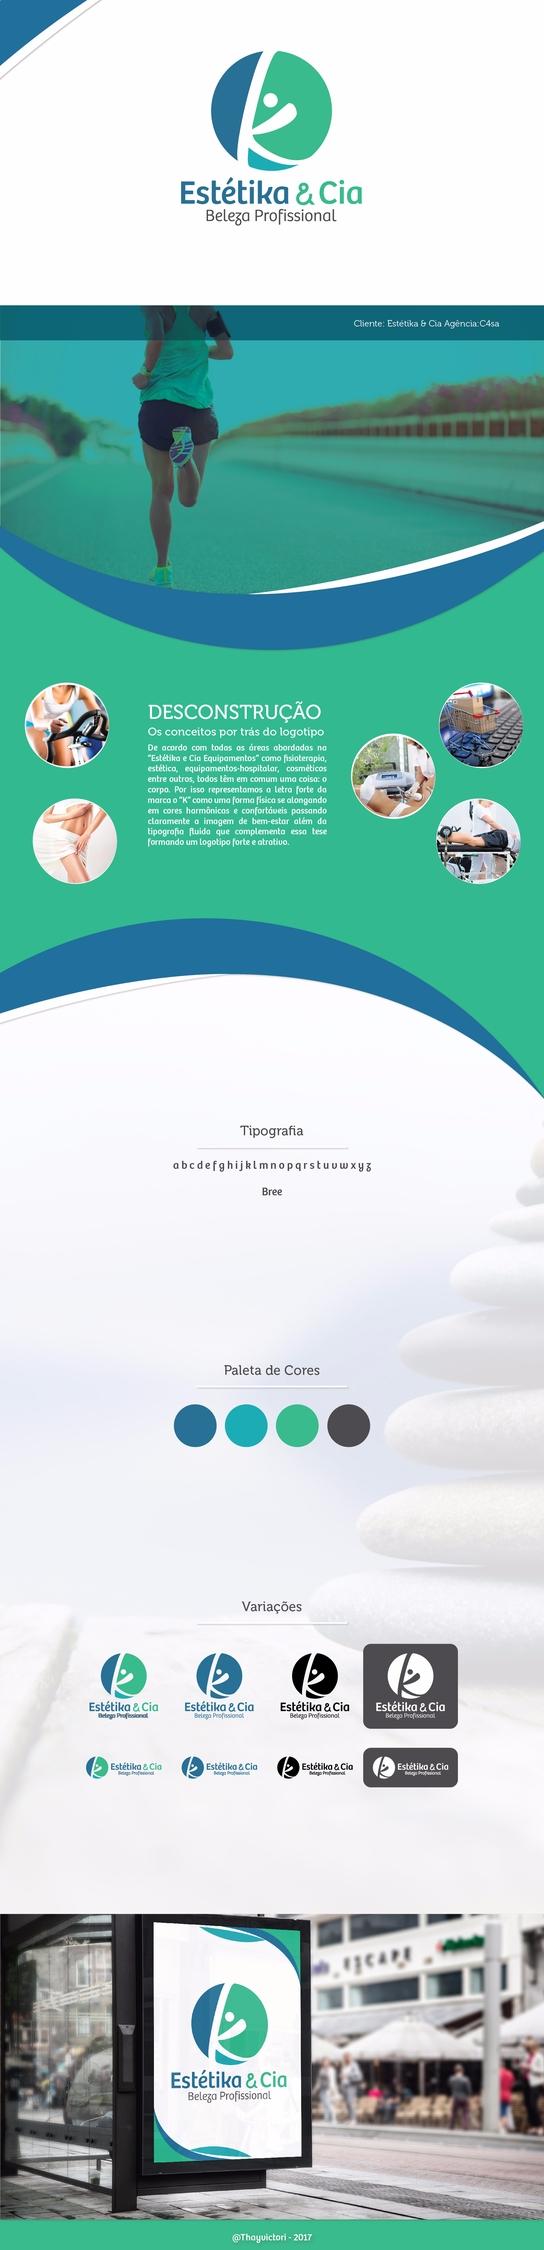 Branding Estétika Cia - viithay | ello